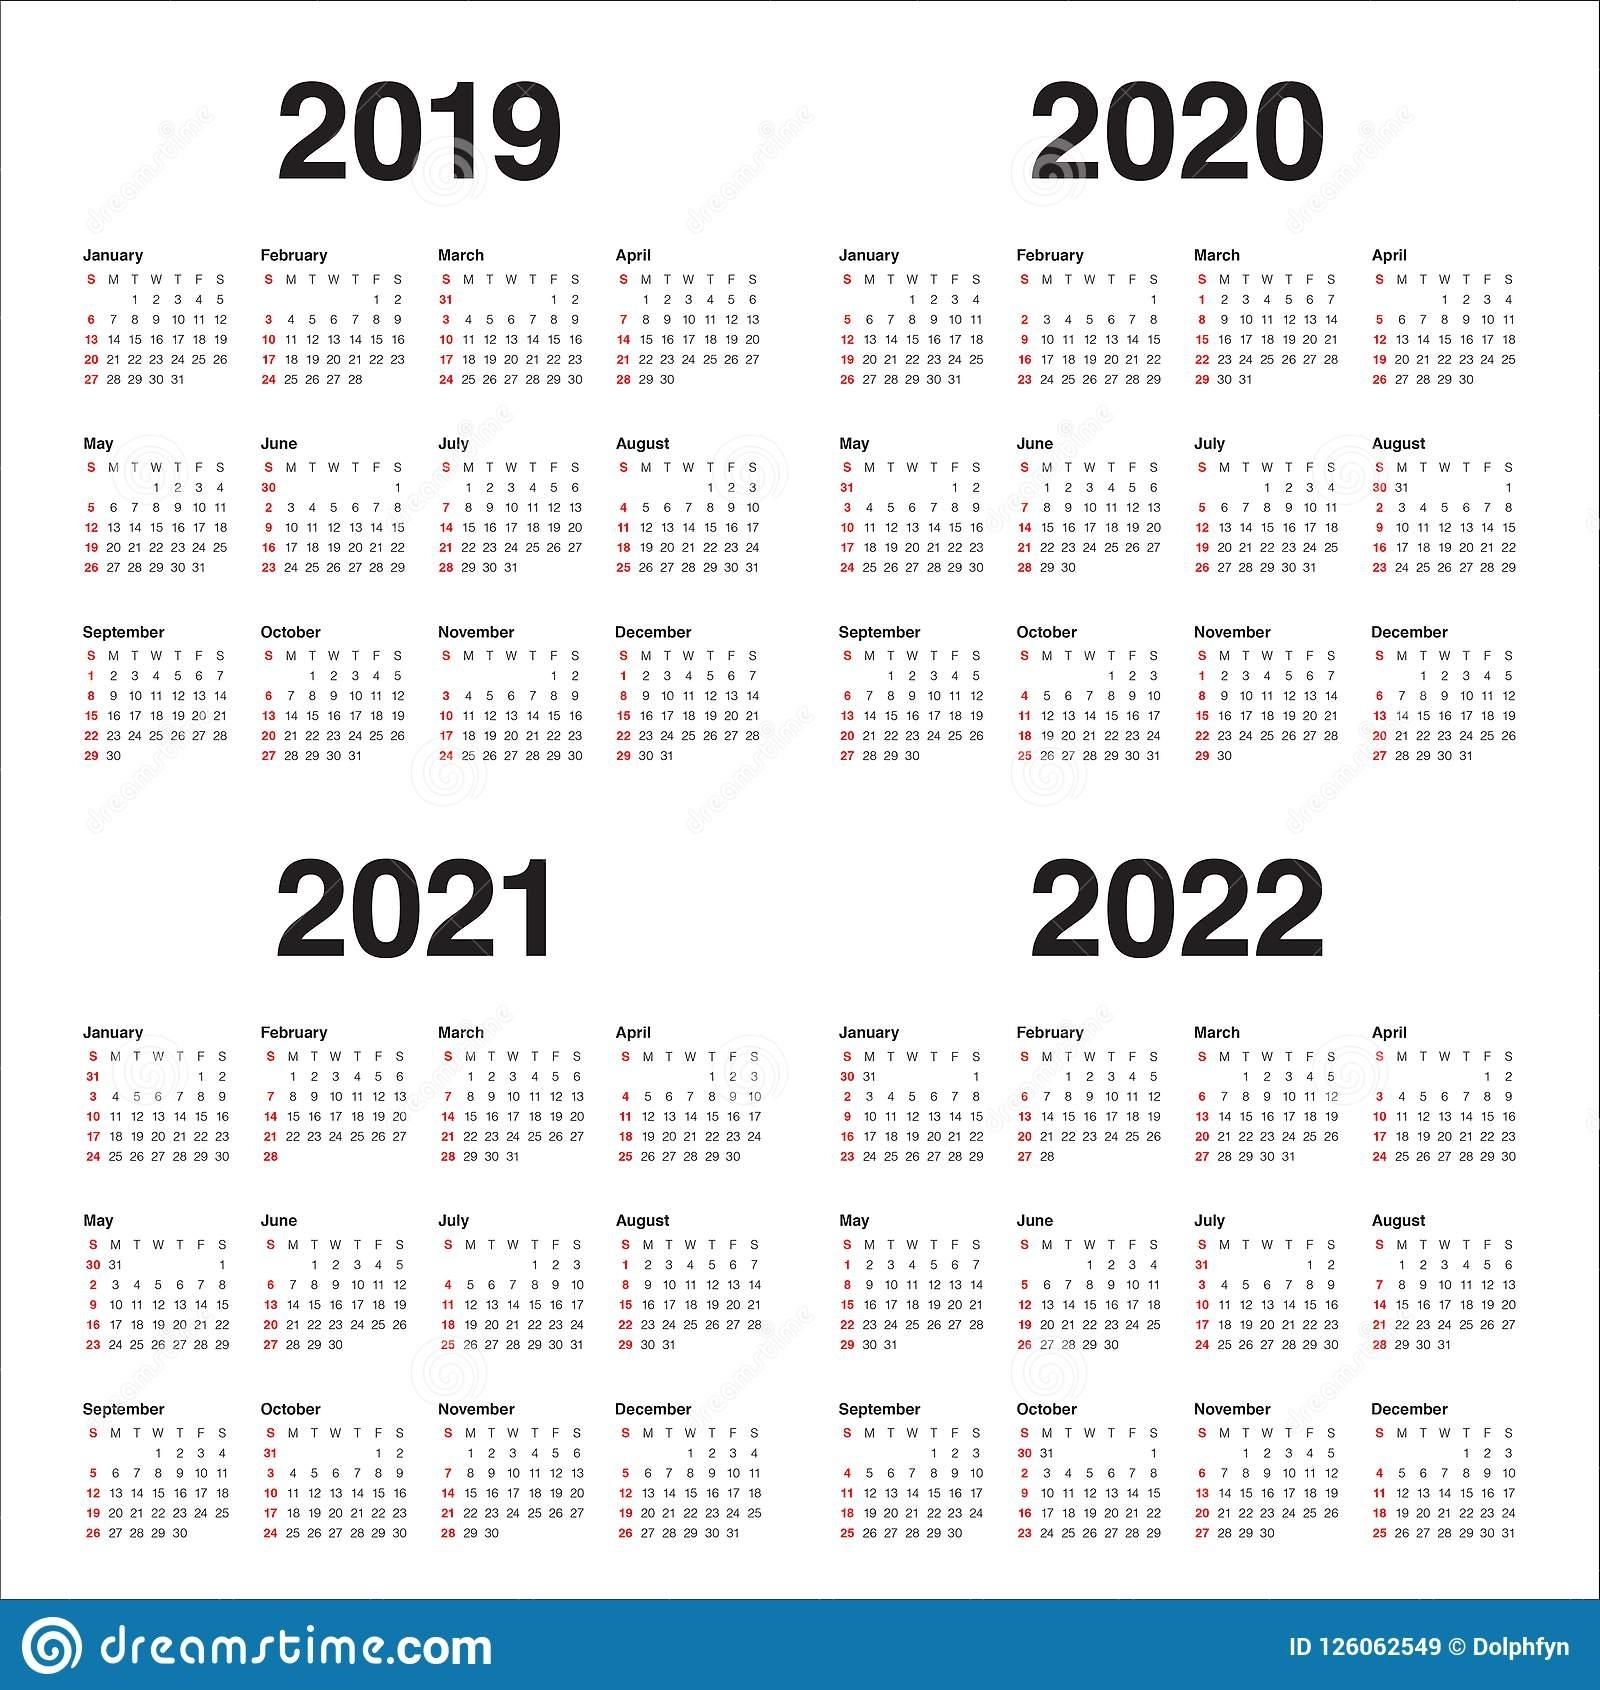 2019 2022 Year Calendar Printable - Calendar Inspiration ...